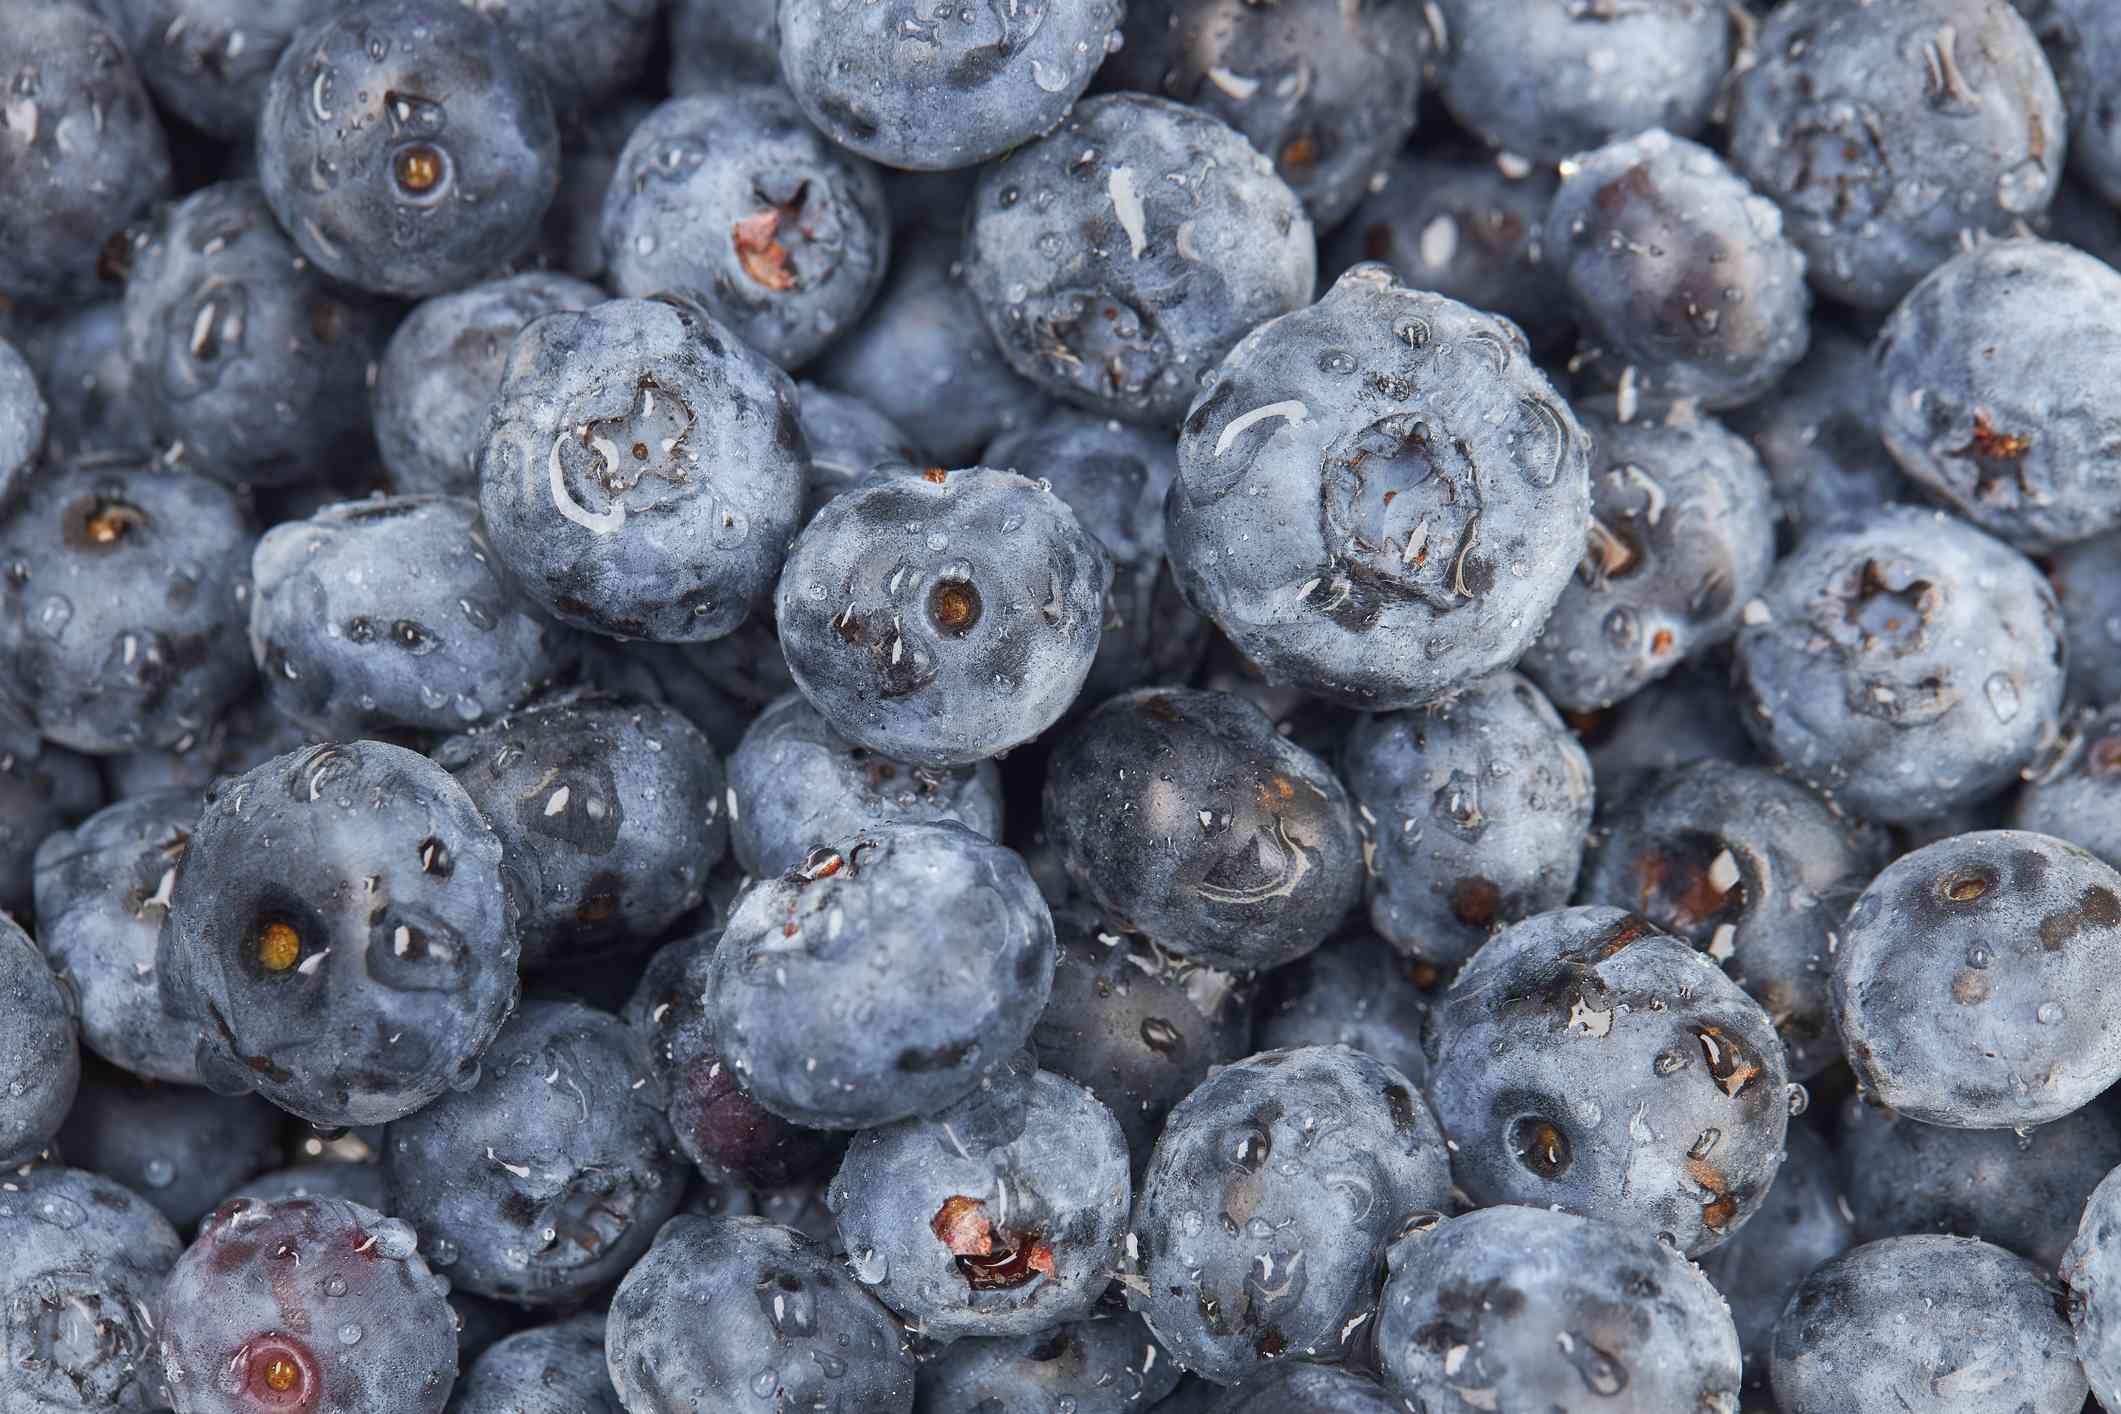 Alaska Fruits and Vegetables Seasonal Produce